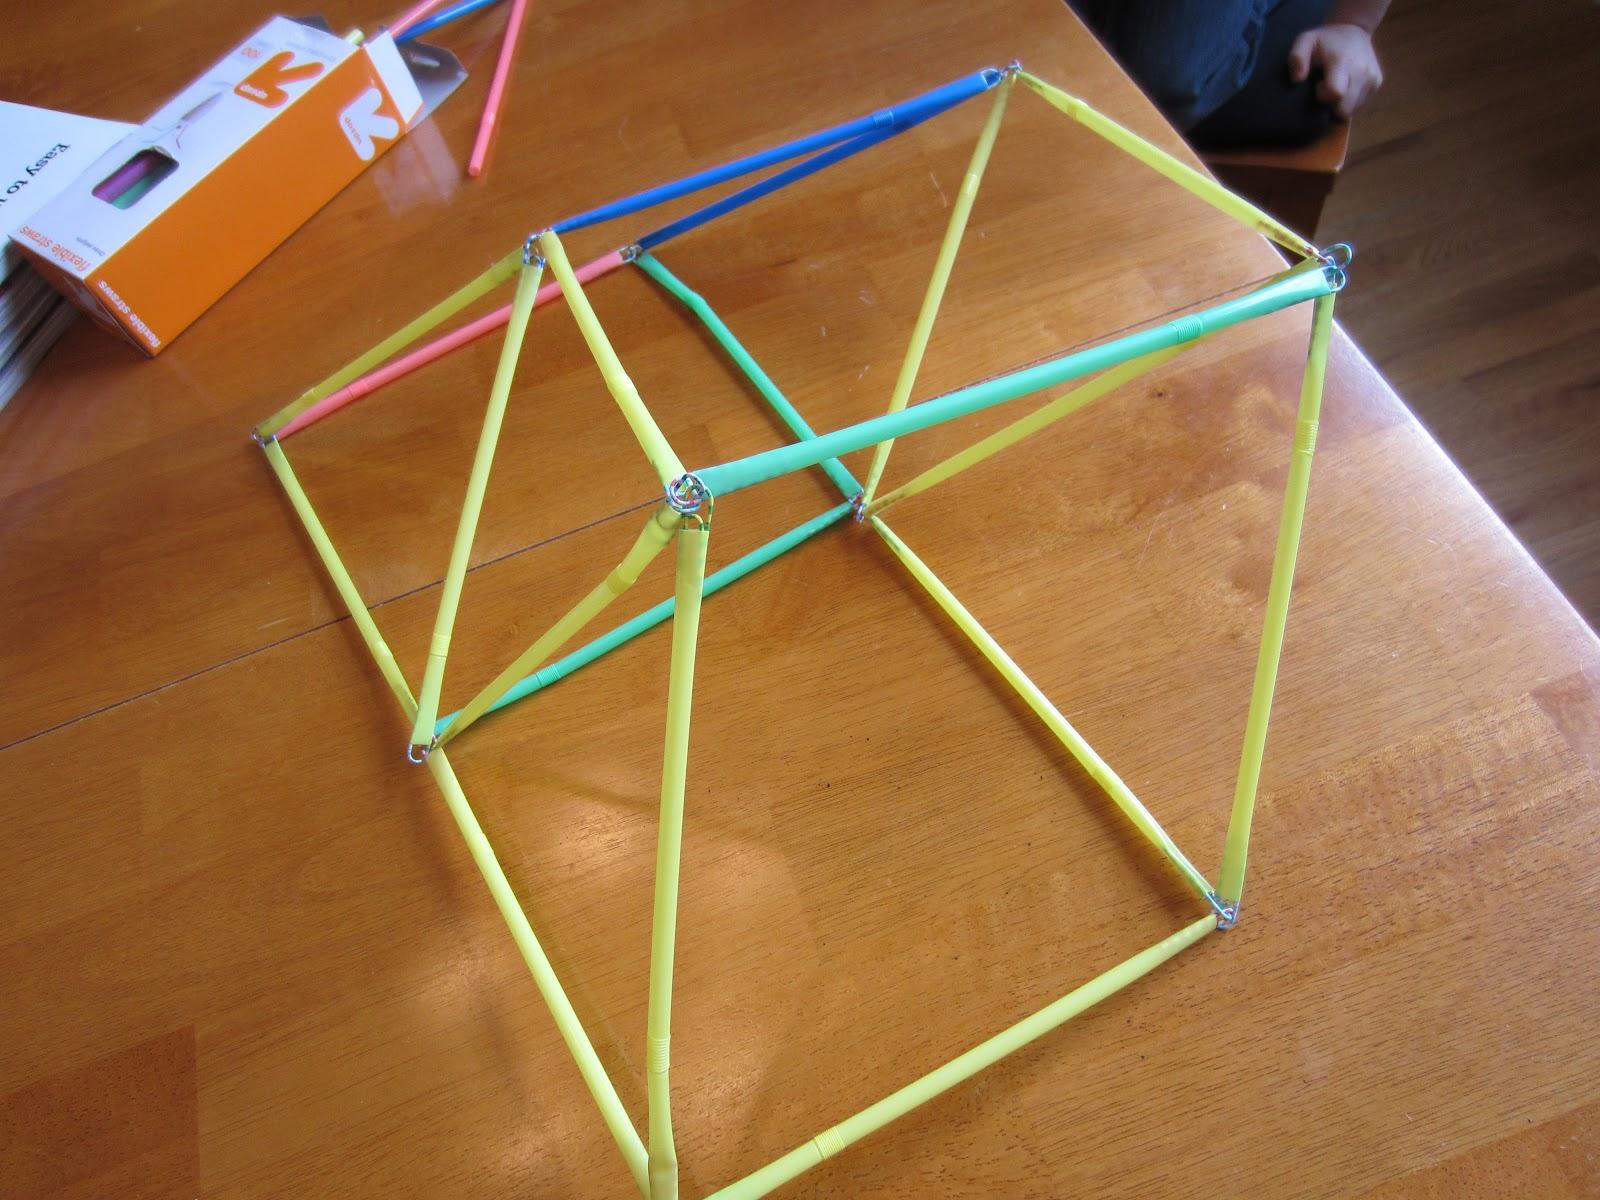 Relentlessly Fun Deceptively Educational Engineering A Bridge